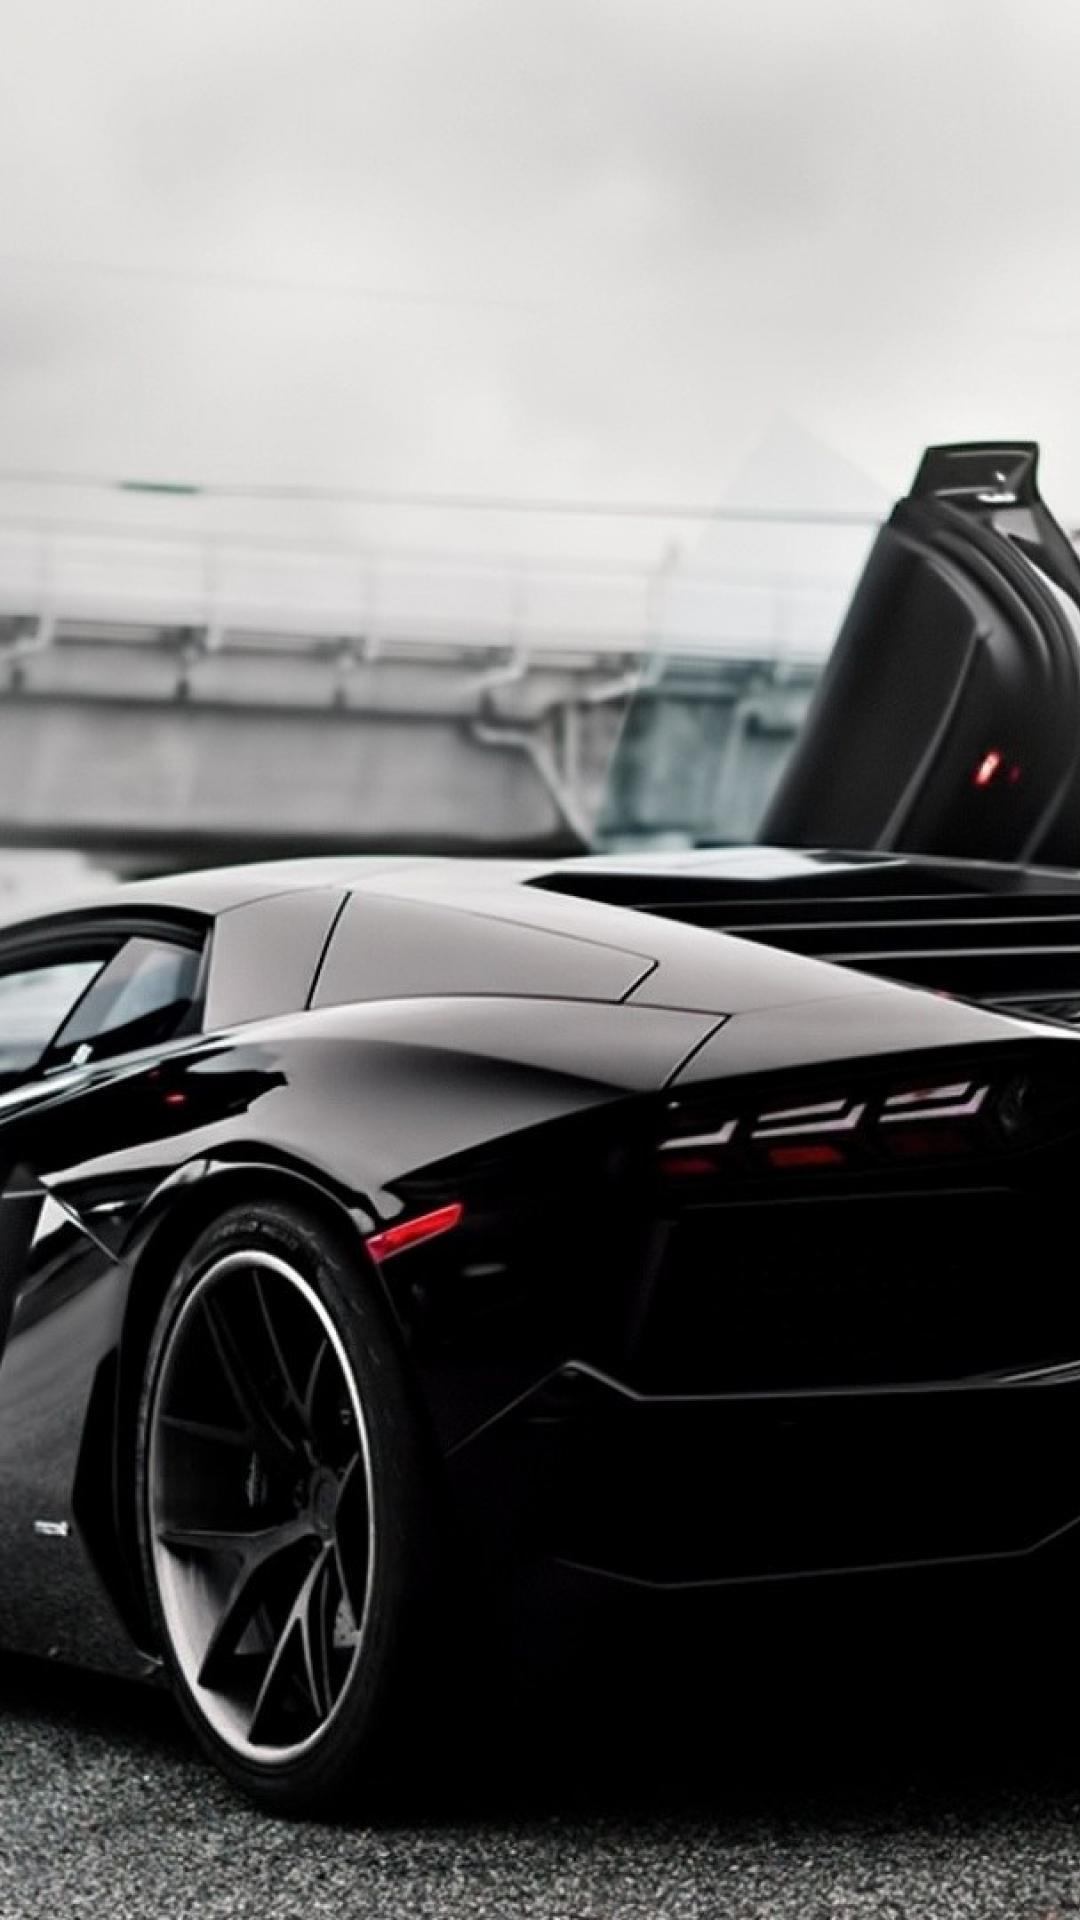 Htc One M8 Wallpaper Hd Car Lamborghini Aventador Htc One Wallpaper